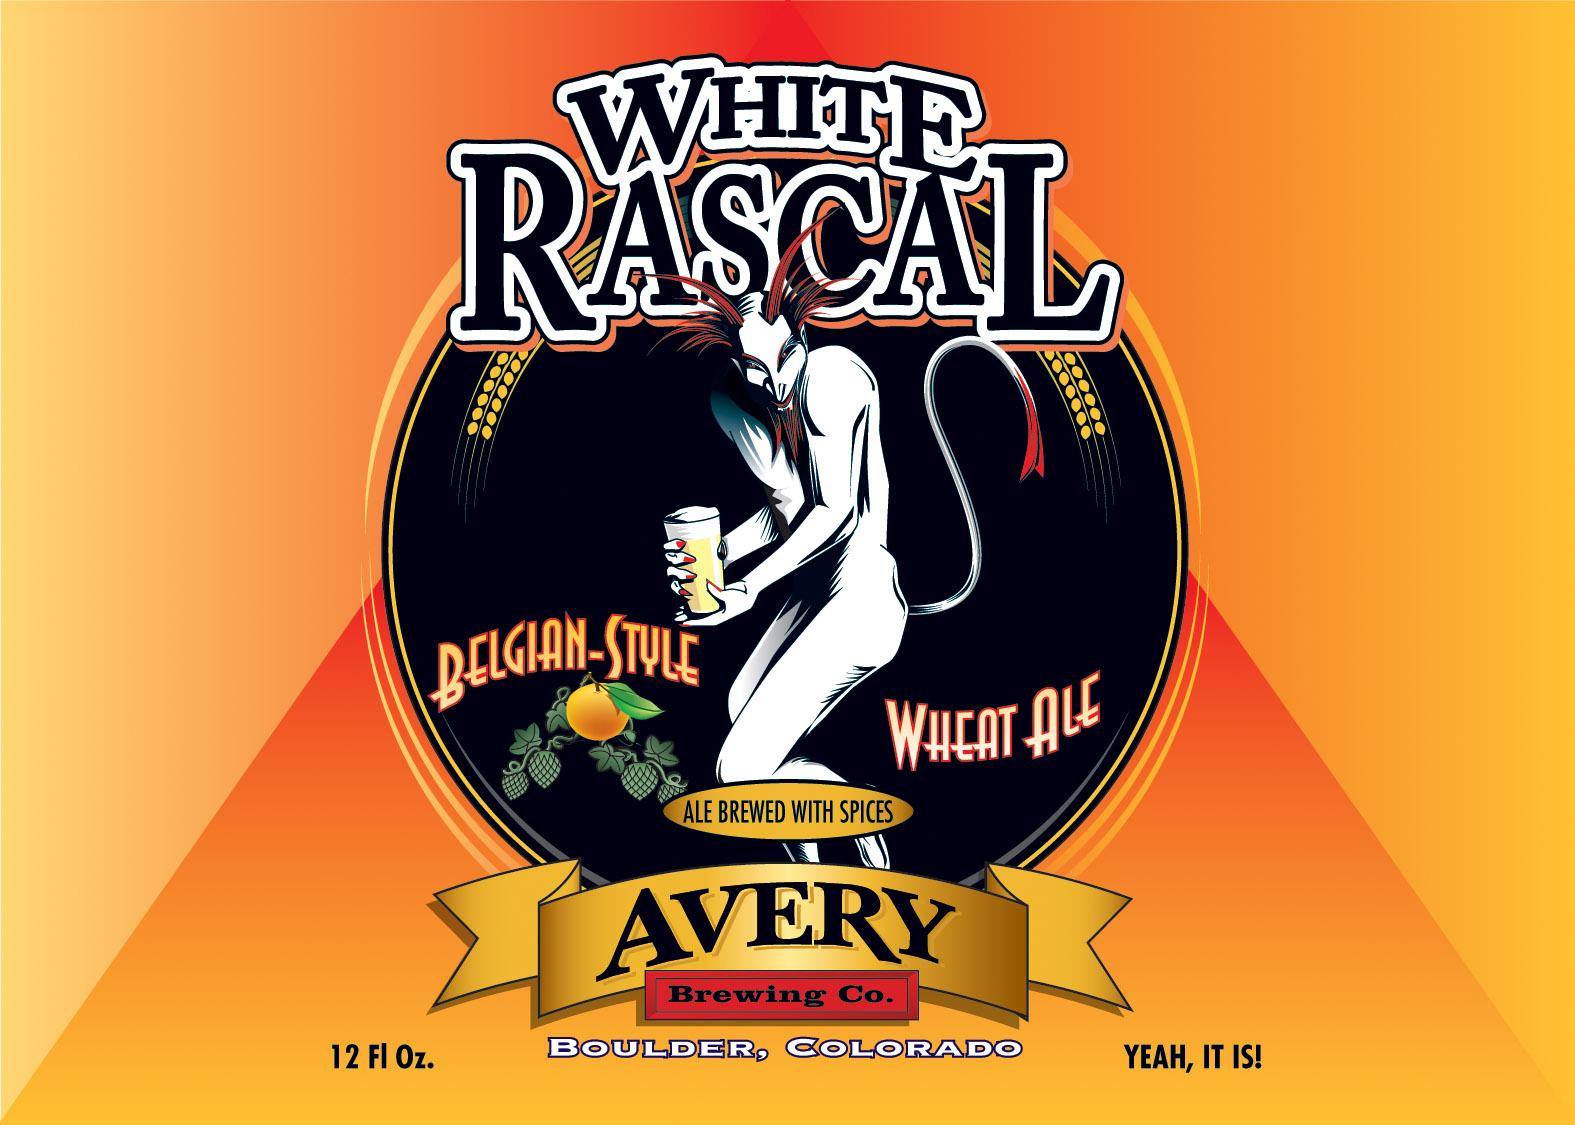 Avery White Rascal